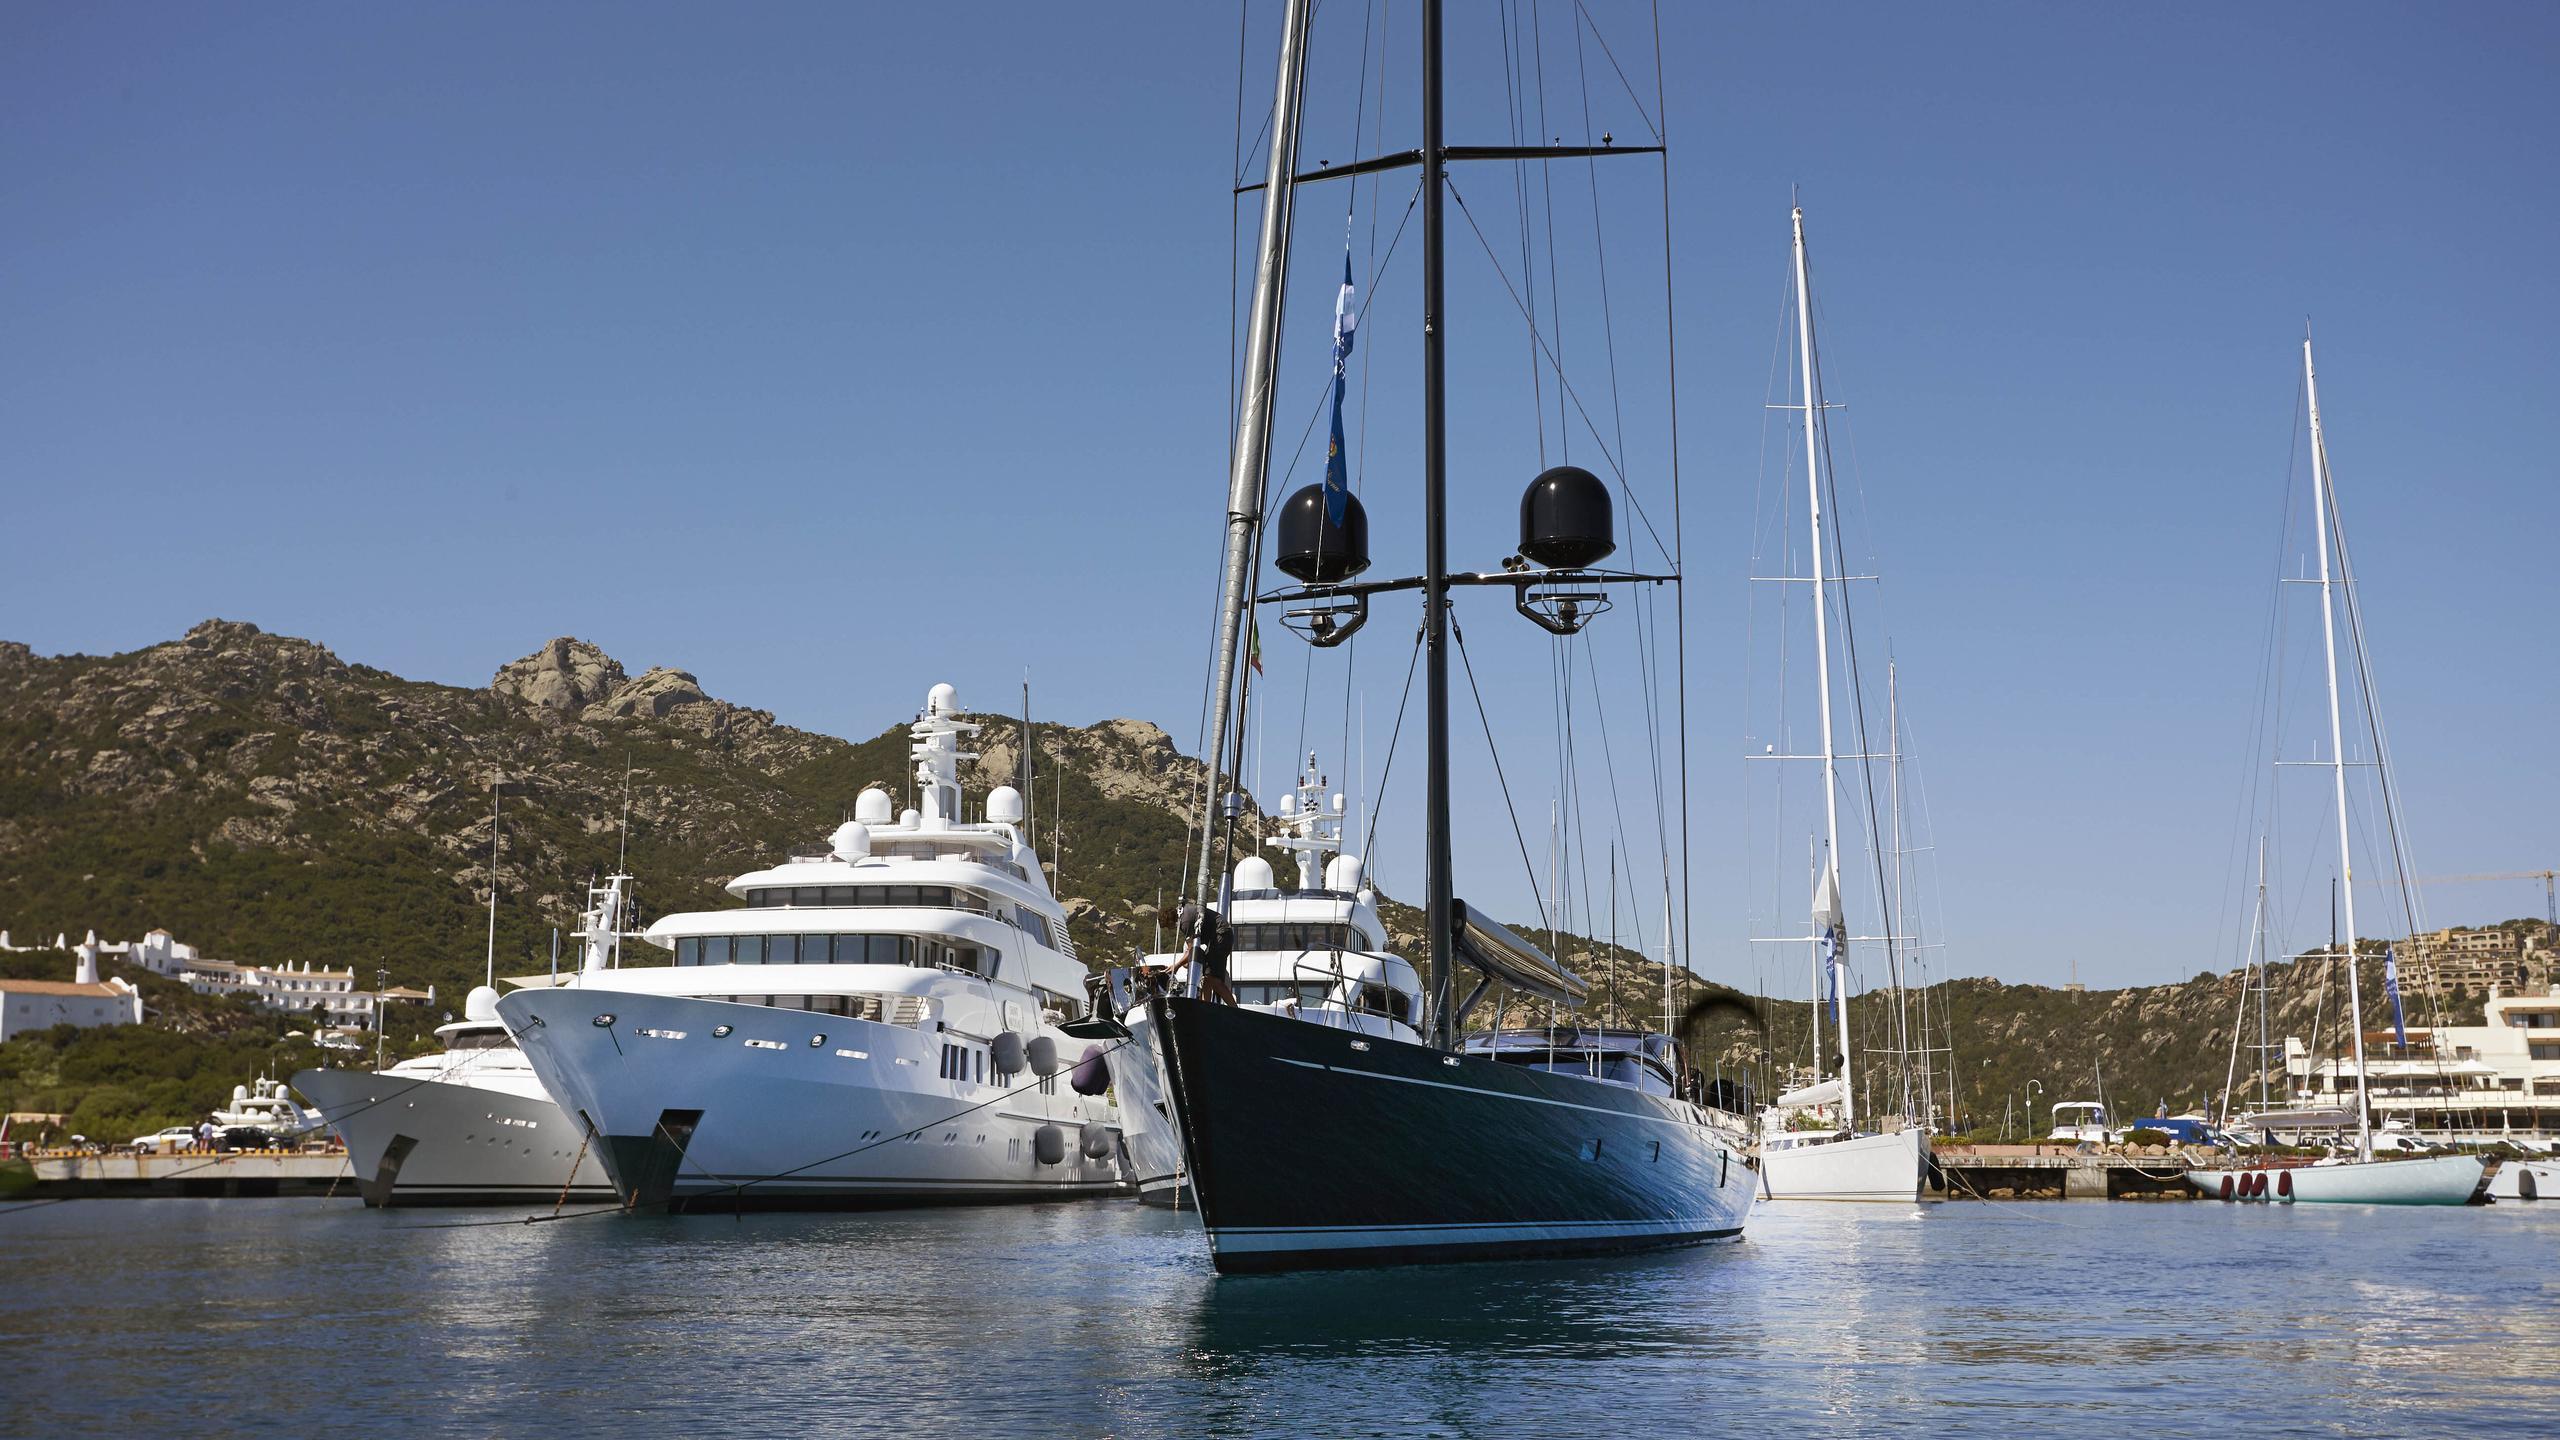 moonbird-yacht-at-anchor